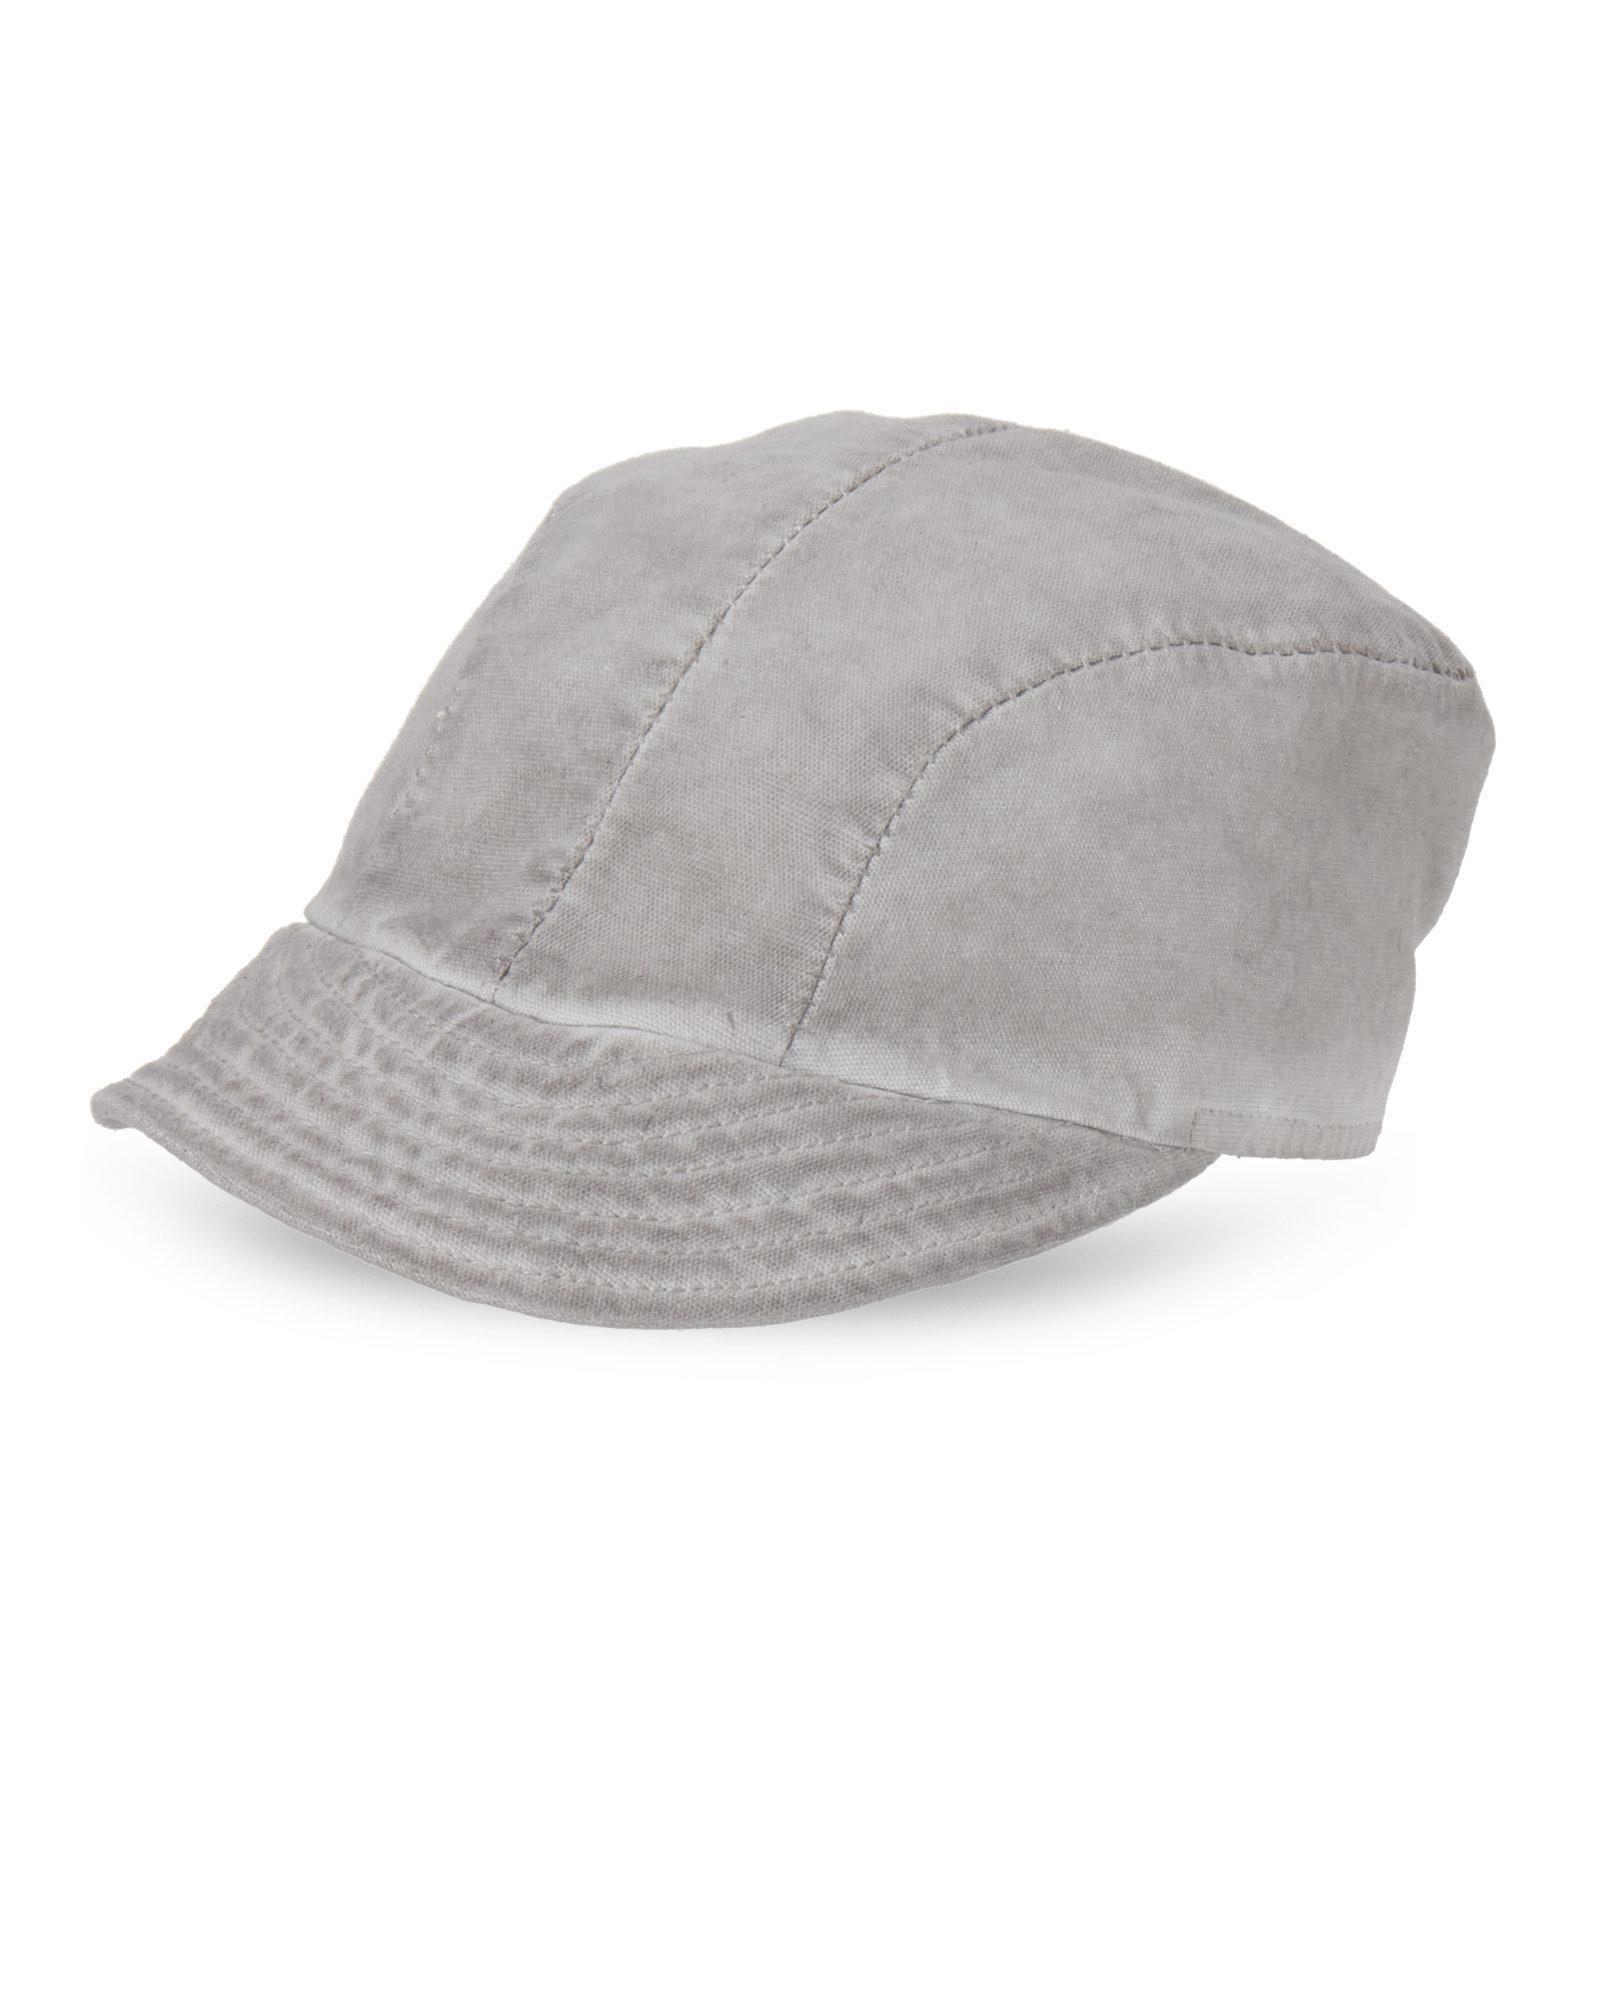 2b2decc94ab0 Masnada Short Billed Hat in Gray for Men - Lyst